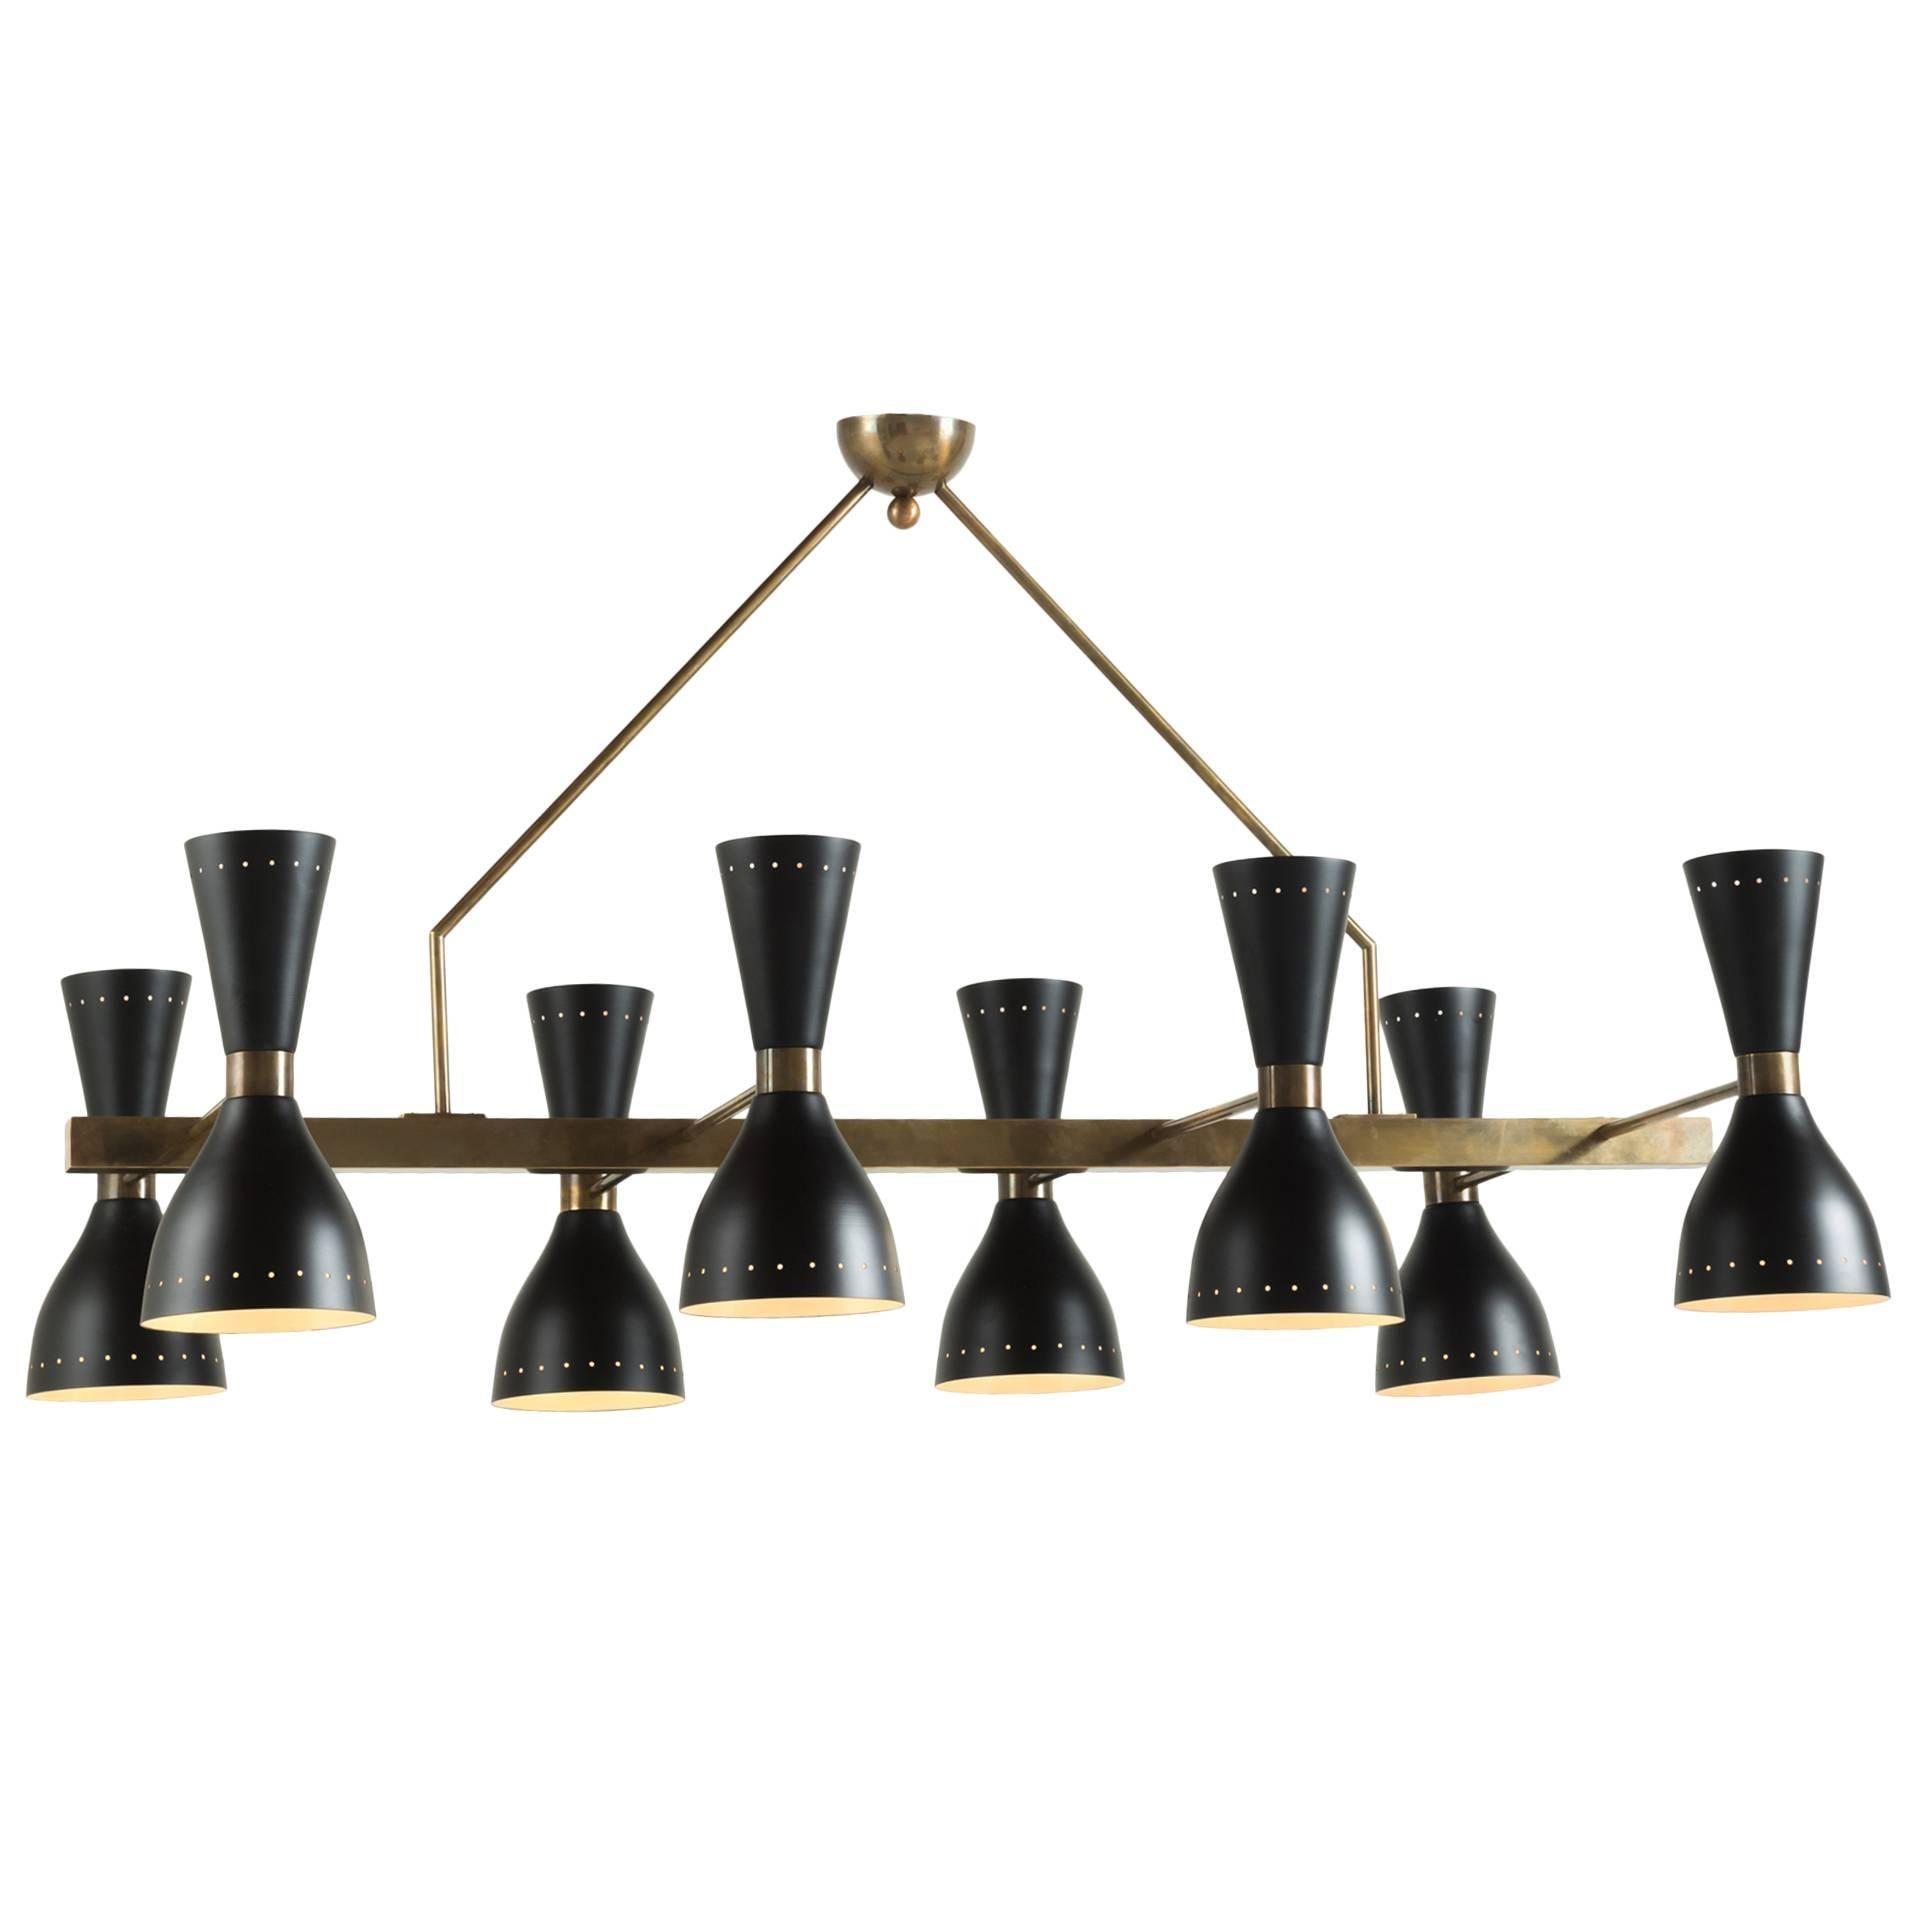 Black & Brass 8-Shade Chandelier, Italy, 21st Century